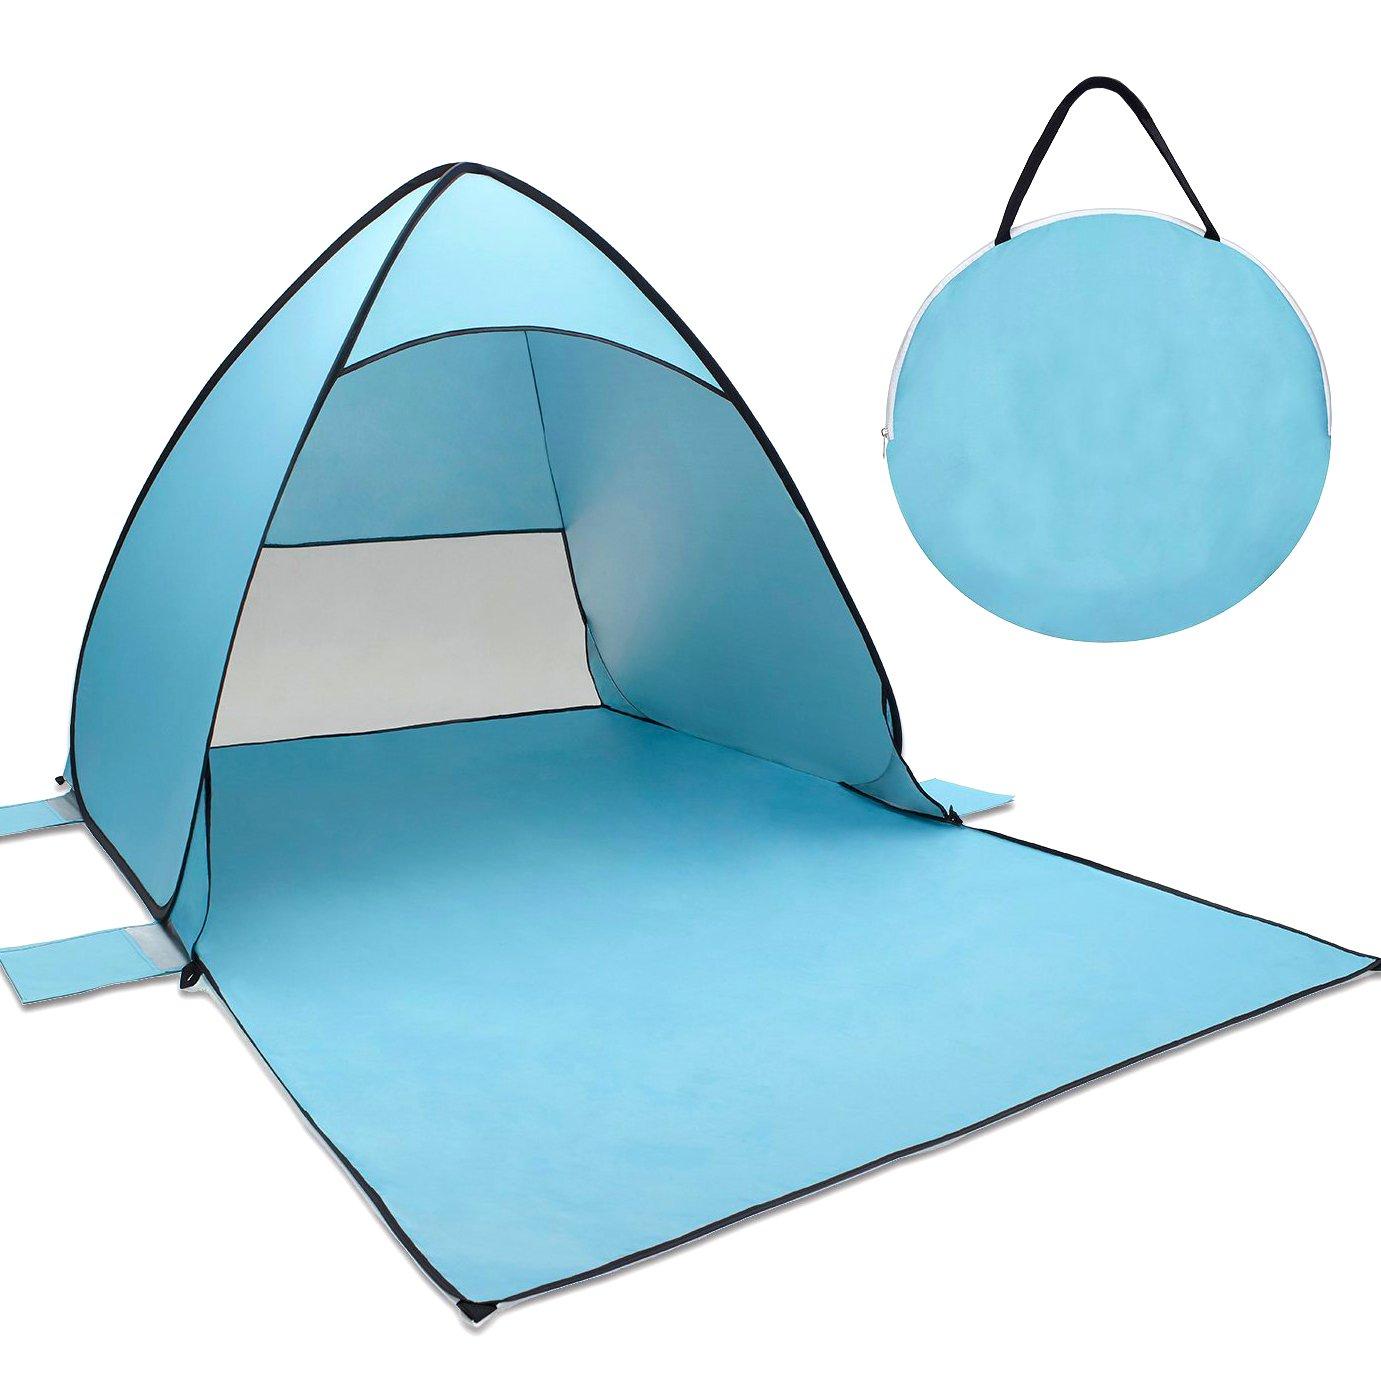 Tecare Pop Up Tent Anti-UV 50+ pour 3-4 personnes / Camping / Backpacking / Randonnée / Léger / Facile à installer Outdoor Beach Tent Shelter 2-3 person) big-tent001